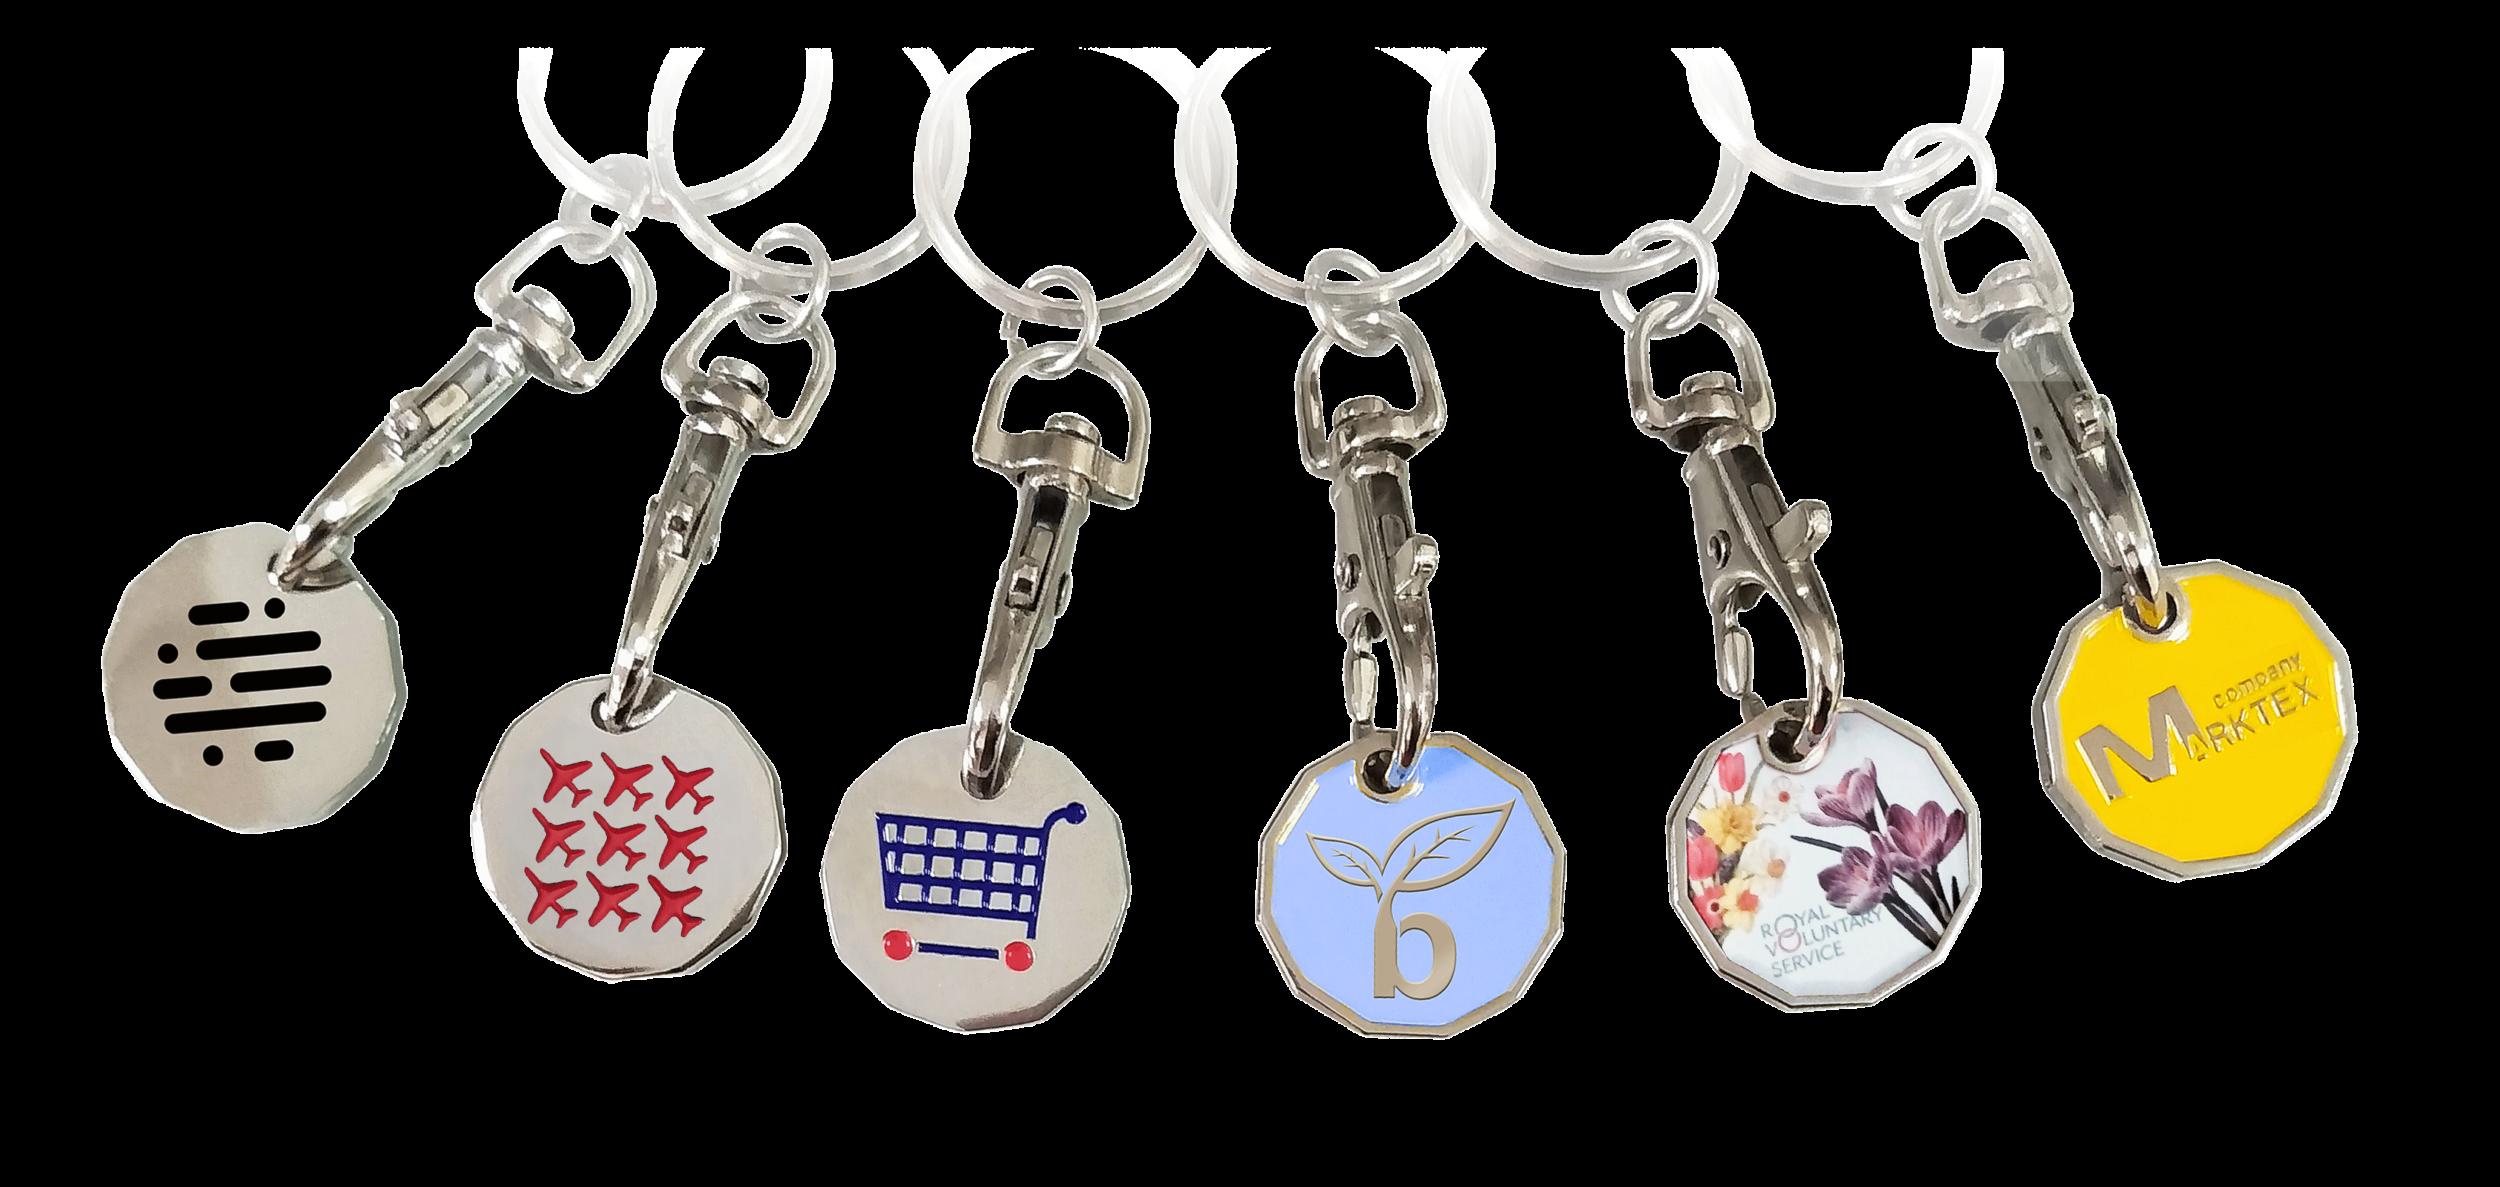 trolley coin keychain-2